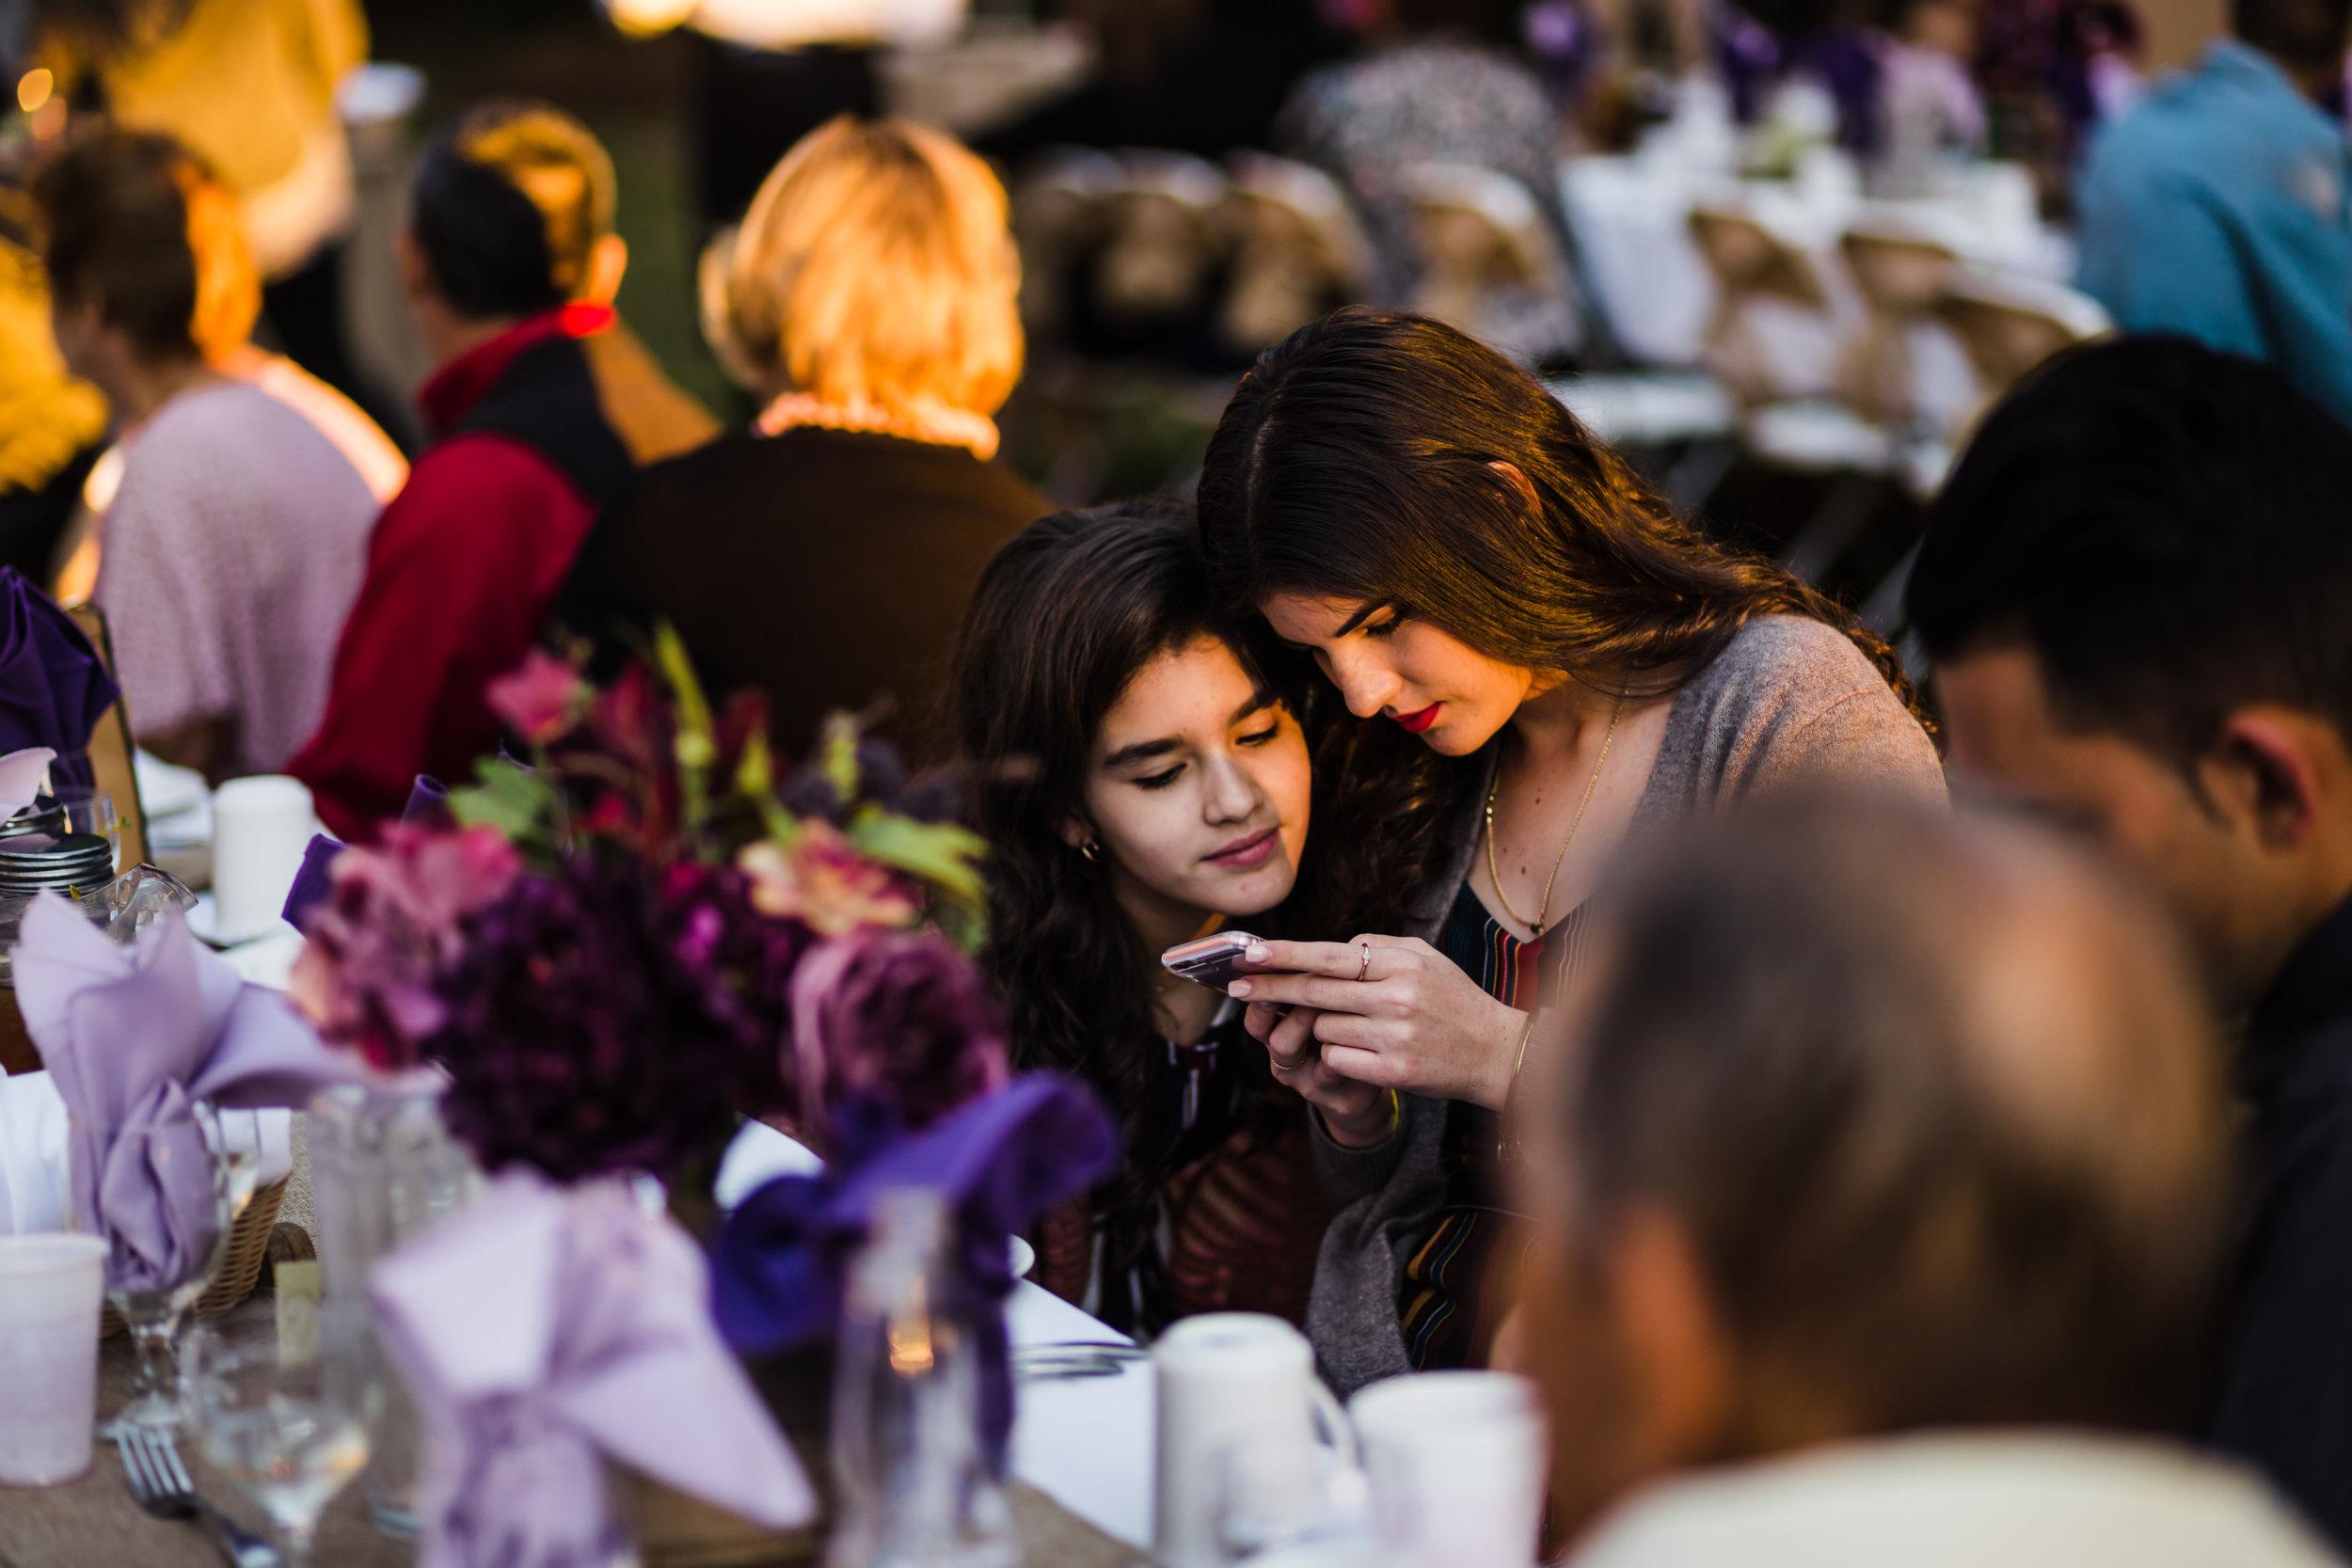 2018.11.03 Jael and Edel Ocala Wedding FINALS (338 of 441).jpg